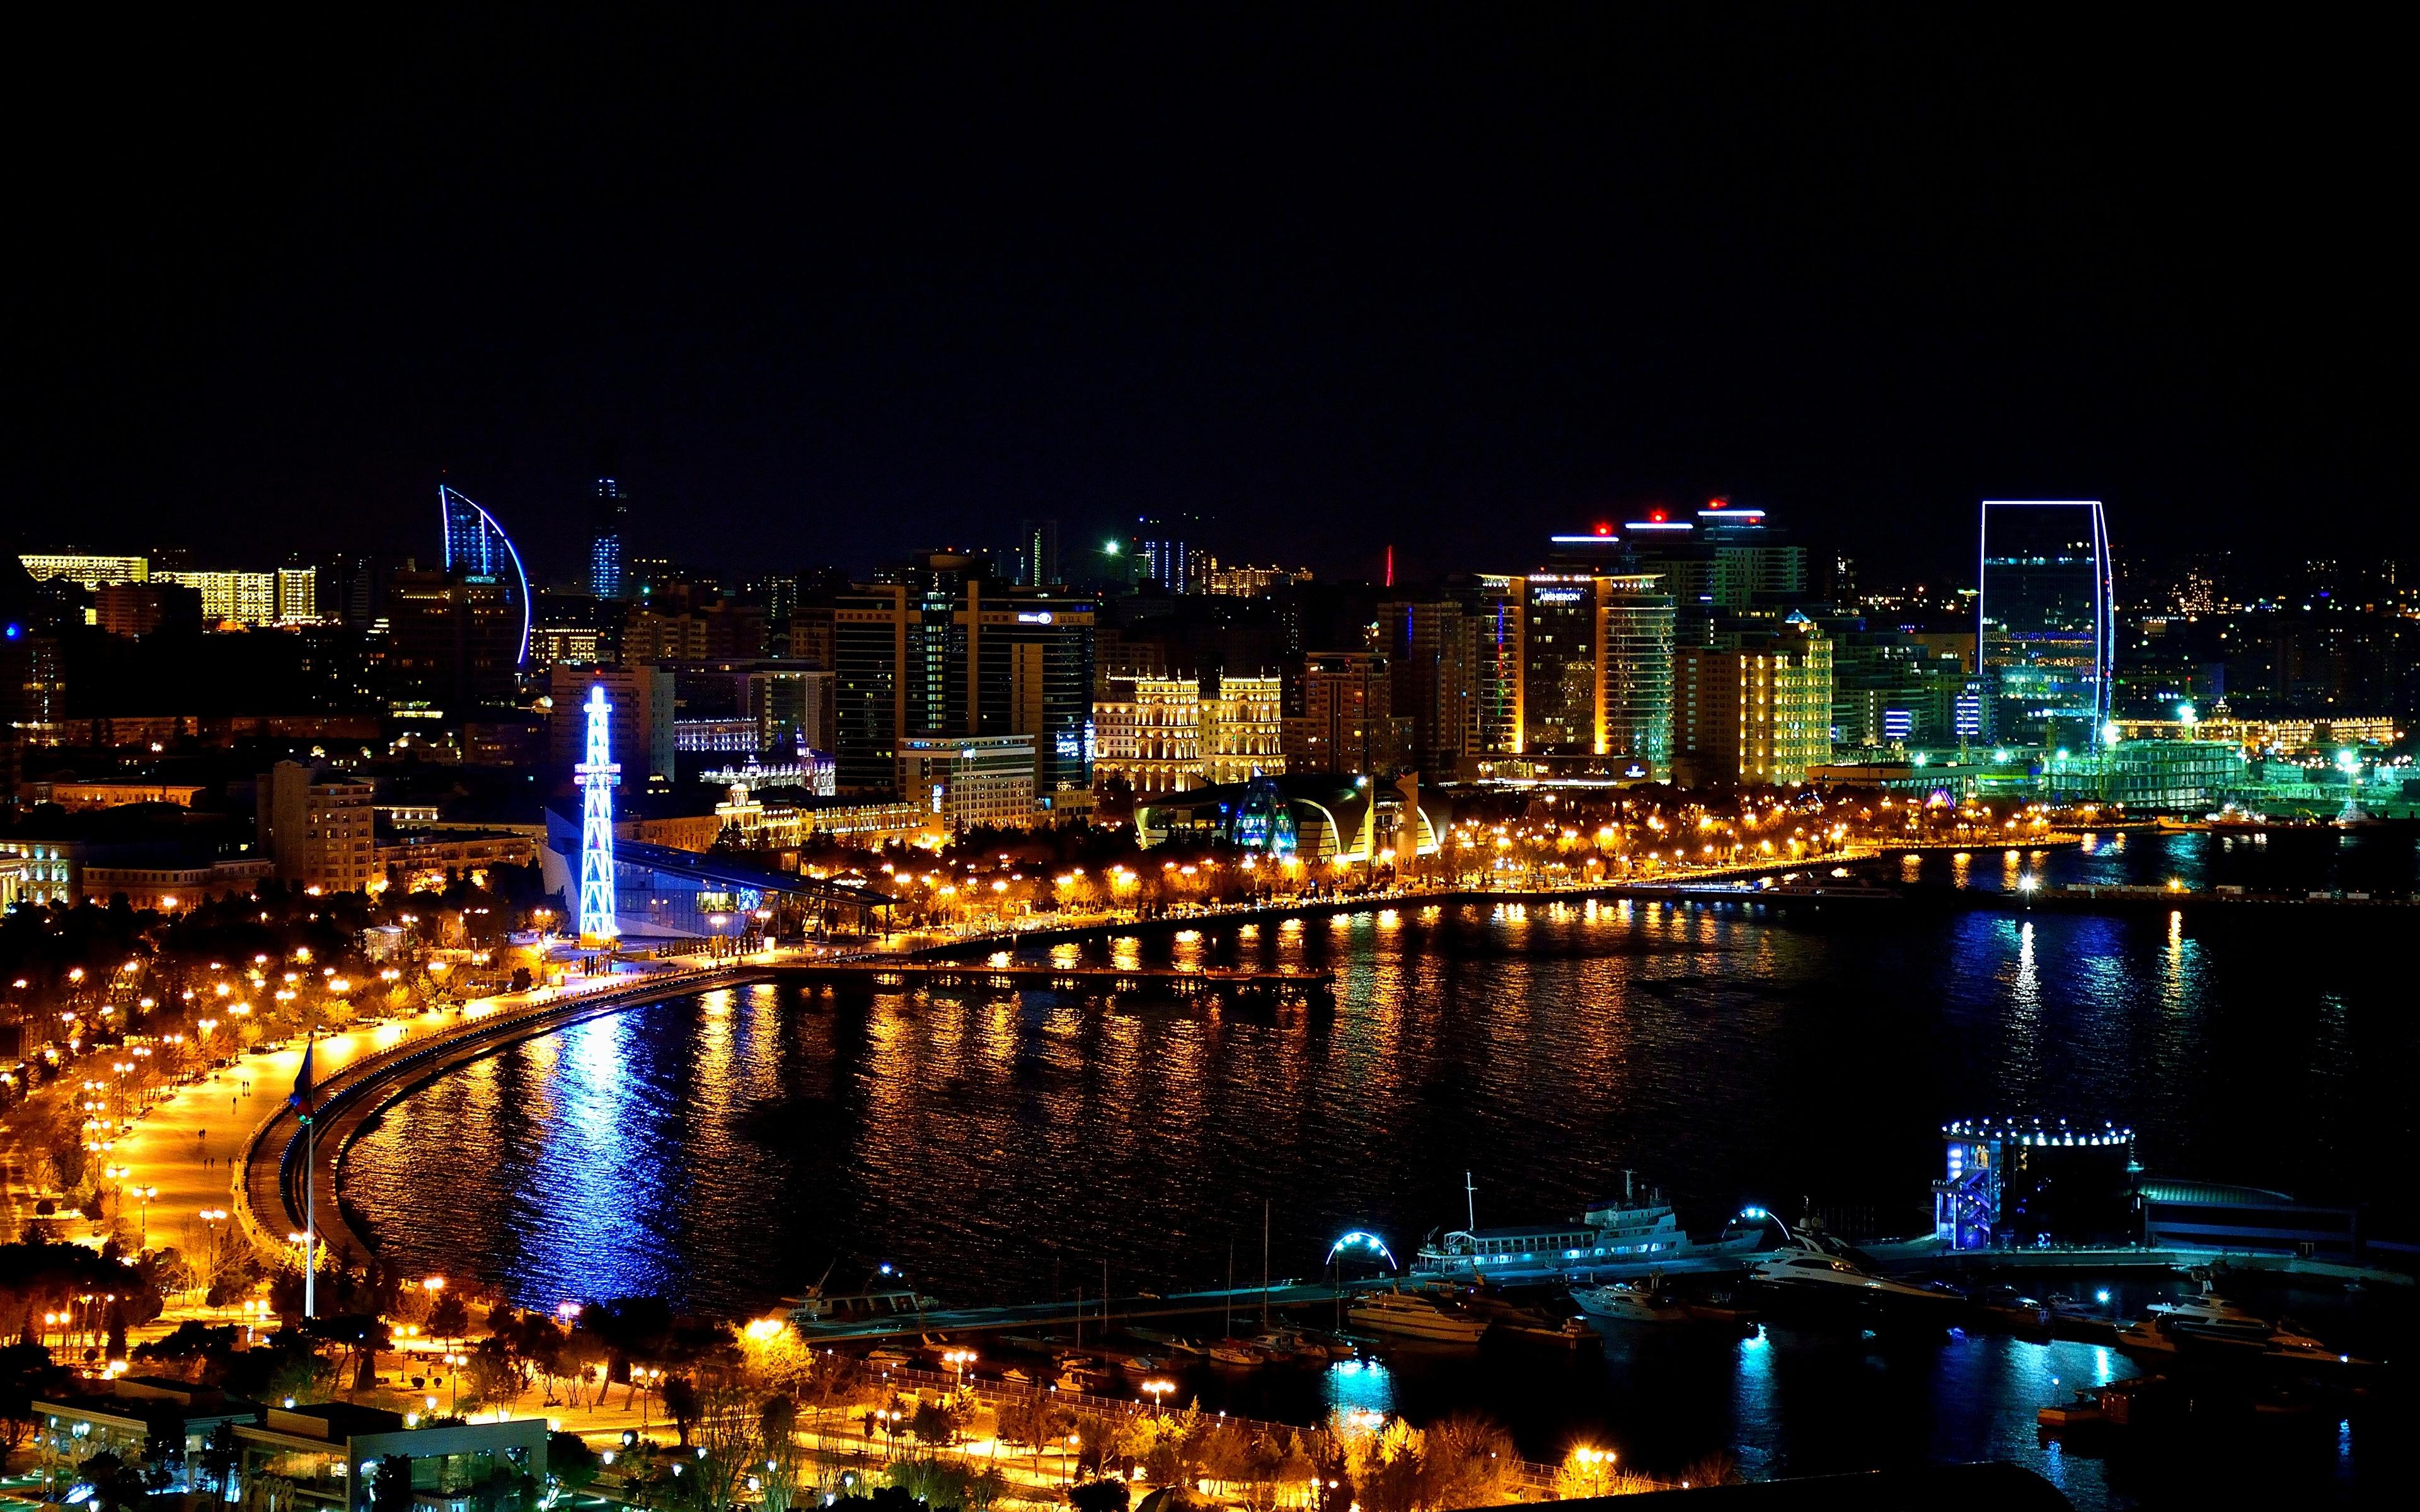 Wallpapers Baku Azerbaijan Night Coast Cities Building 3840x2400 3840x2400